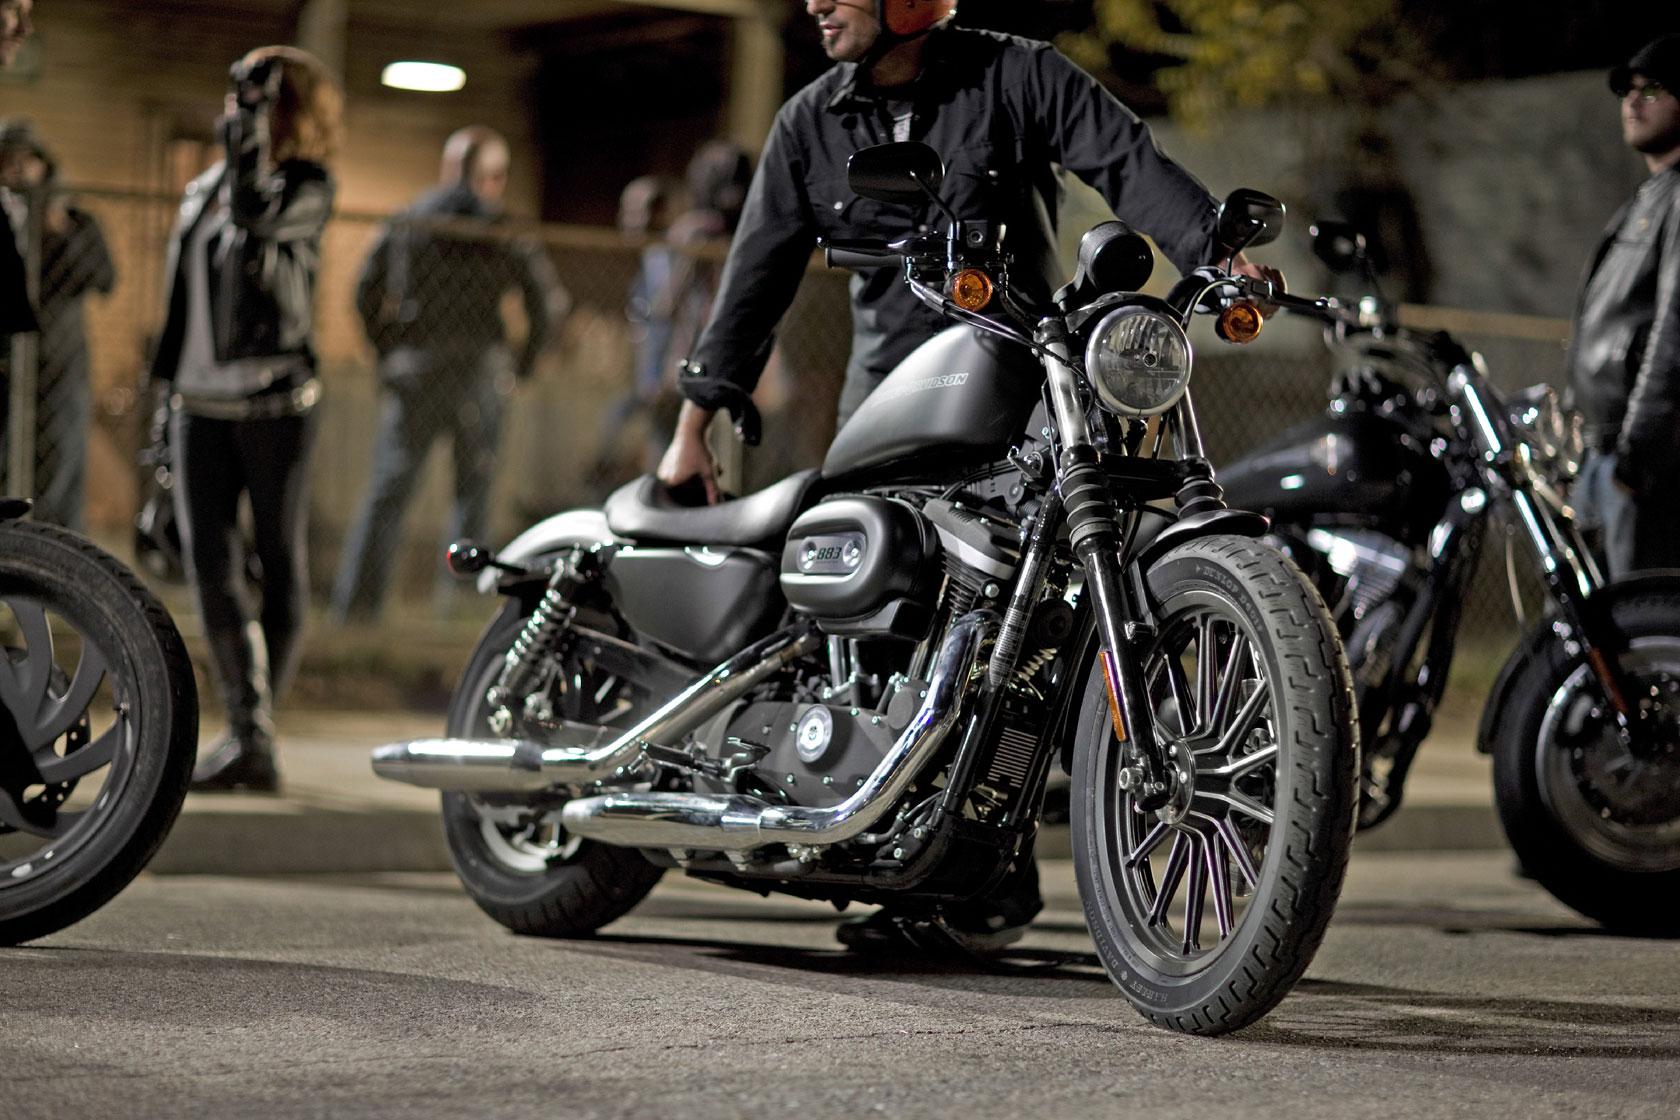 2009 Harley Davidson Sportster 883 Iron XL883N f wallpaper 1680x1120 1680x1120